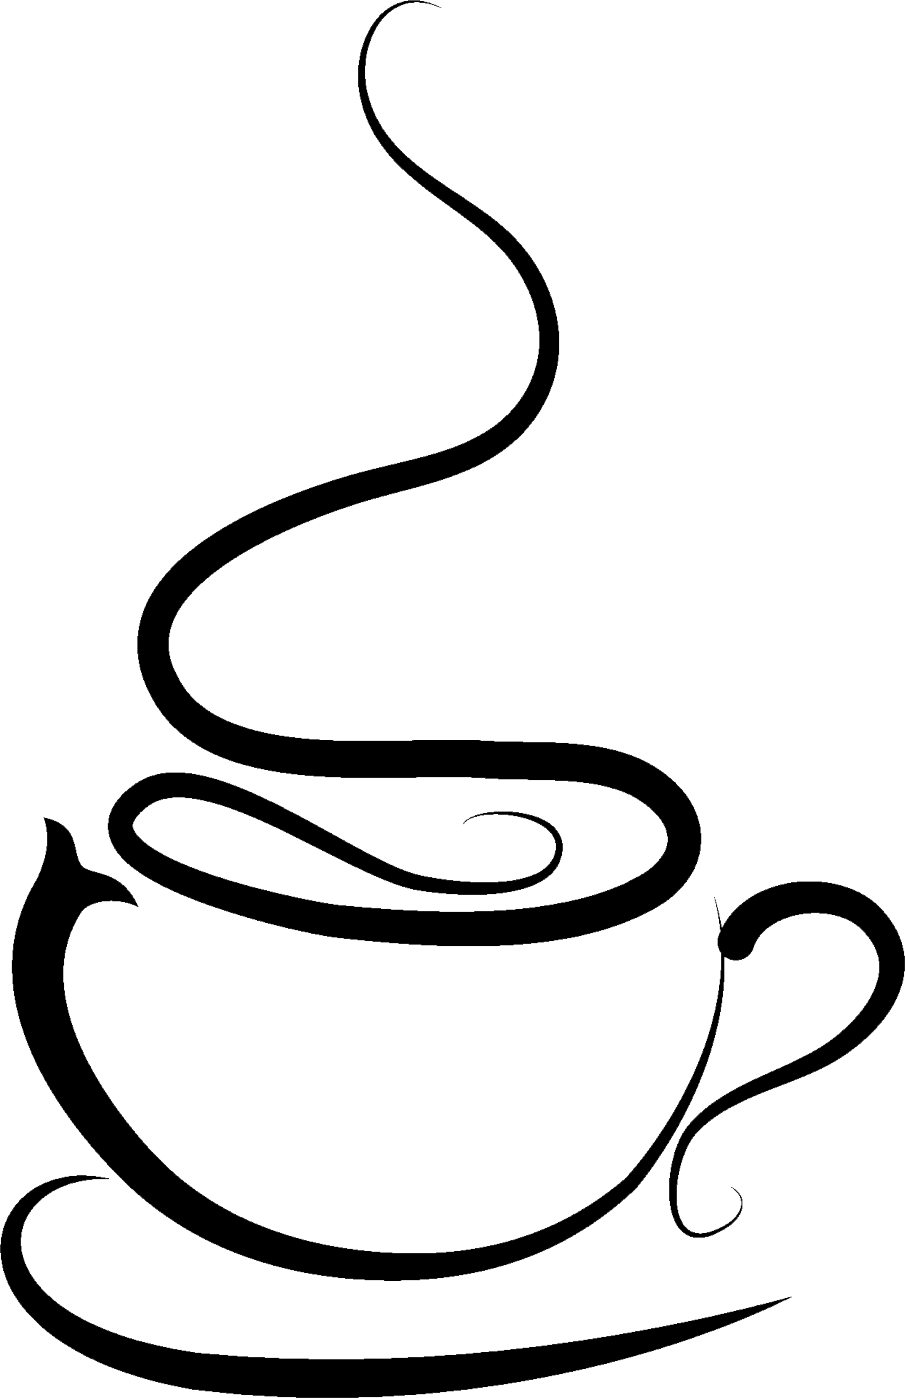 C u p l. Coffee clipart coffee bar